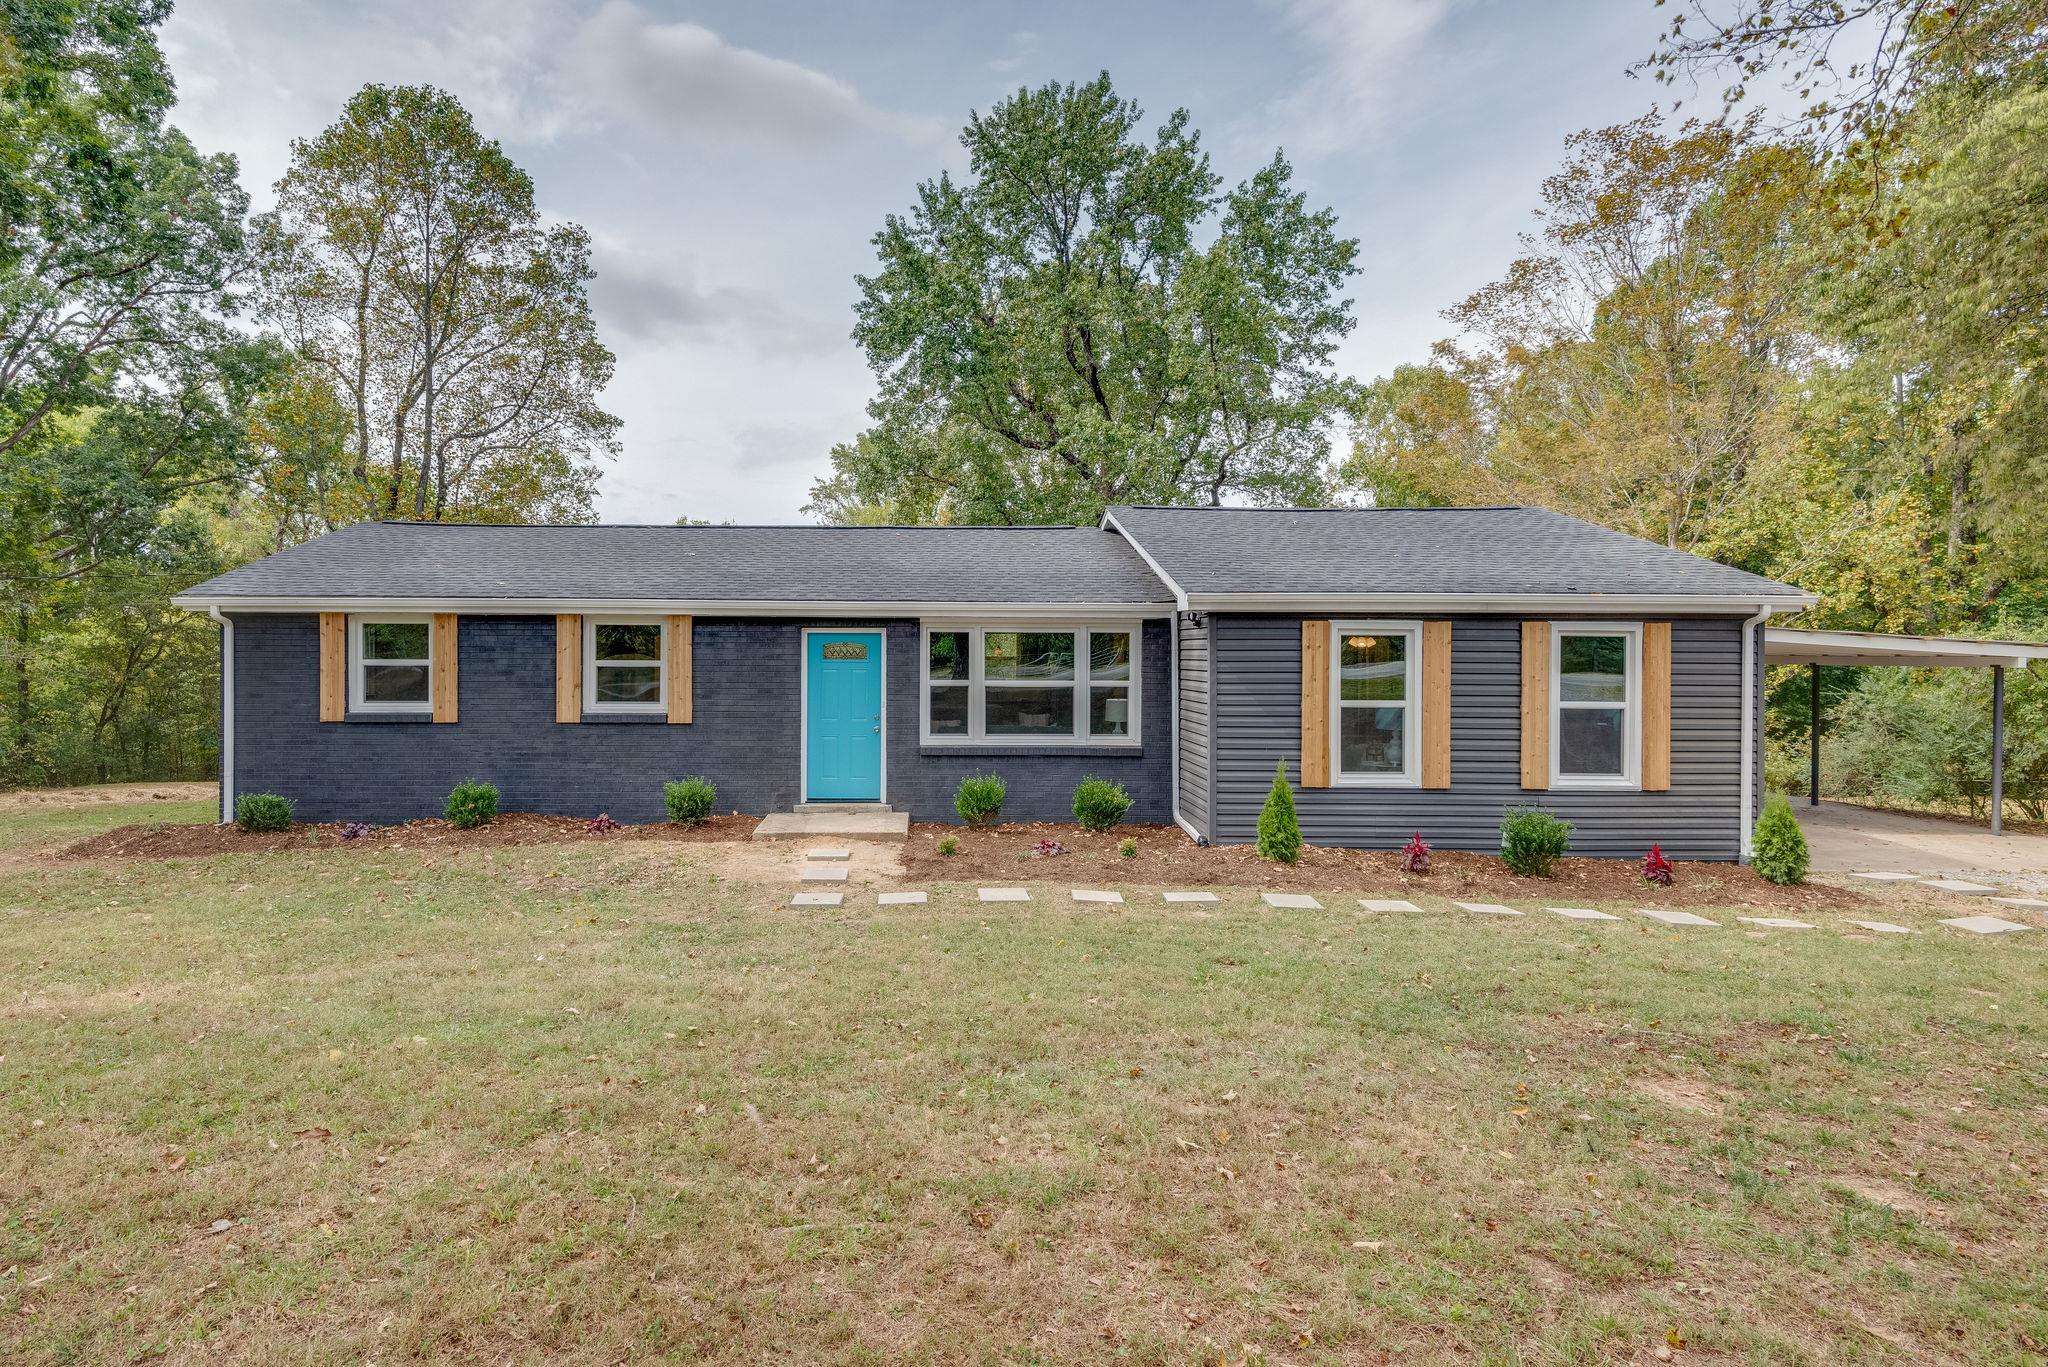 2856 Union Hill Rd, Joelton, TN 37080 - Joelton, TN real estate listing